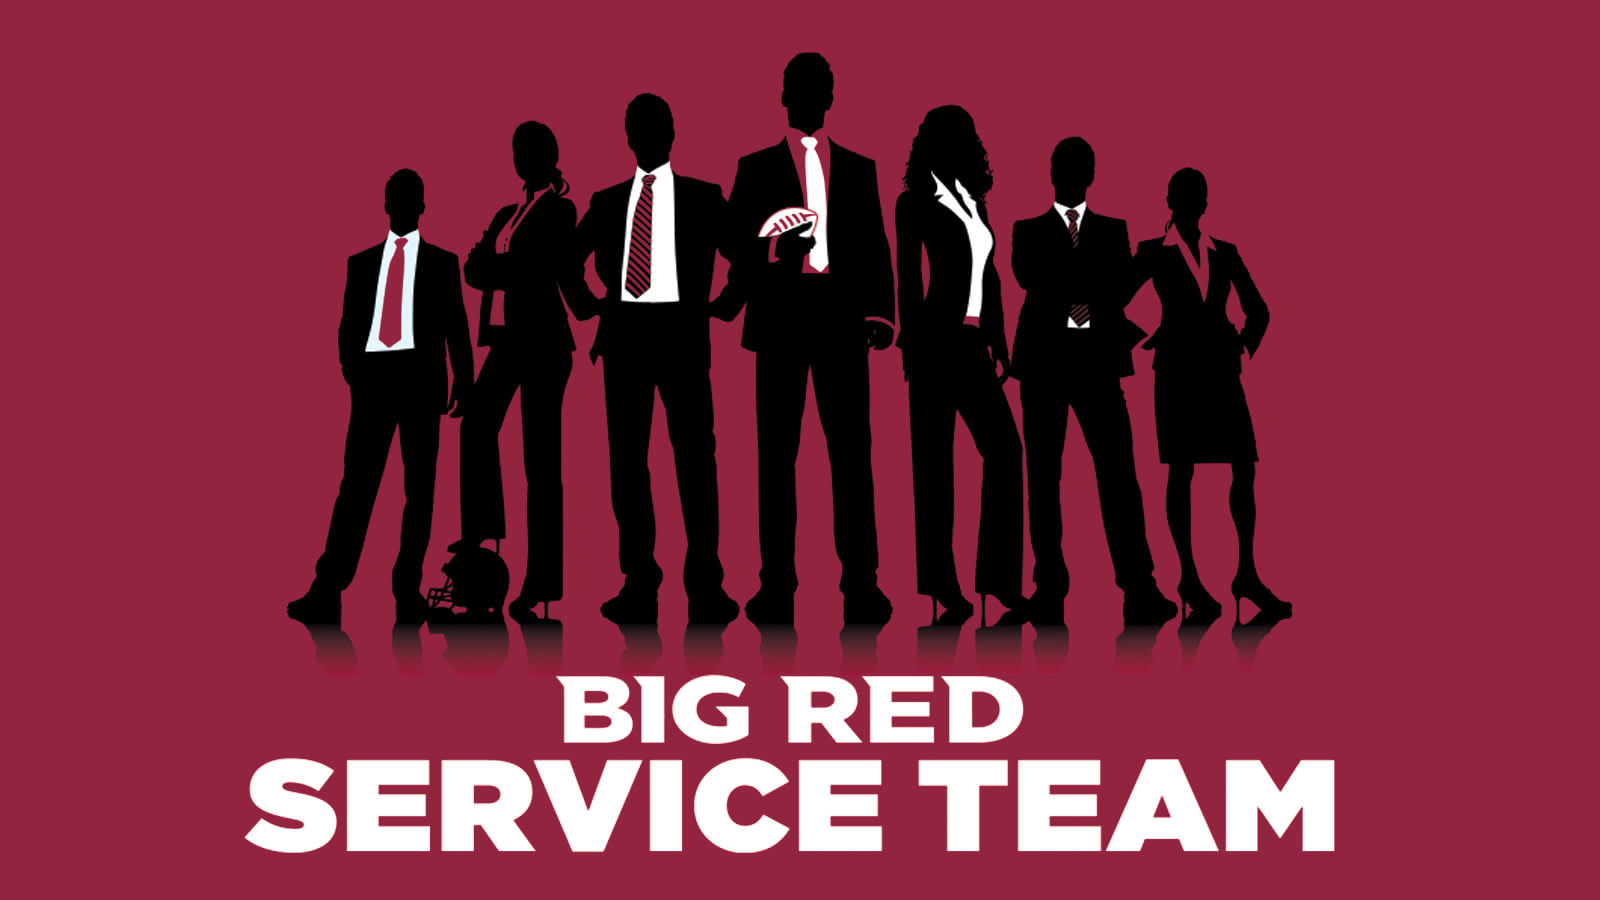 Big Red Service Team